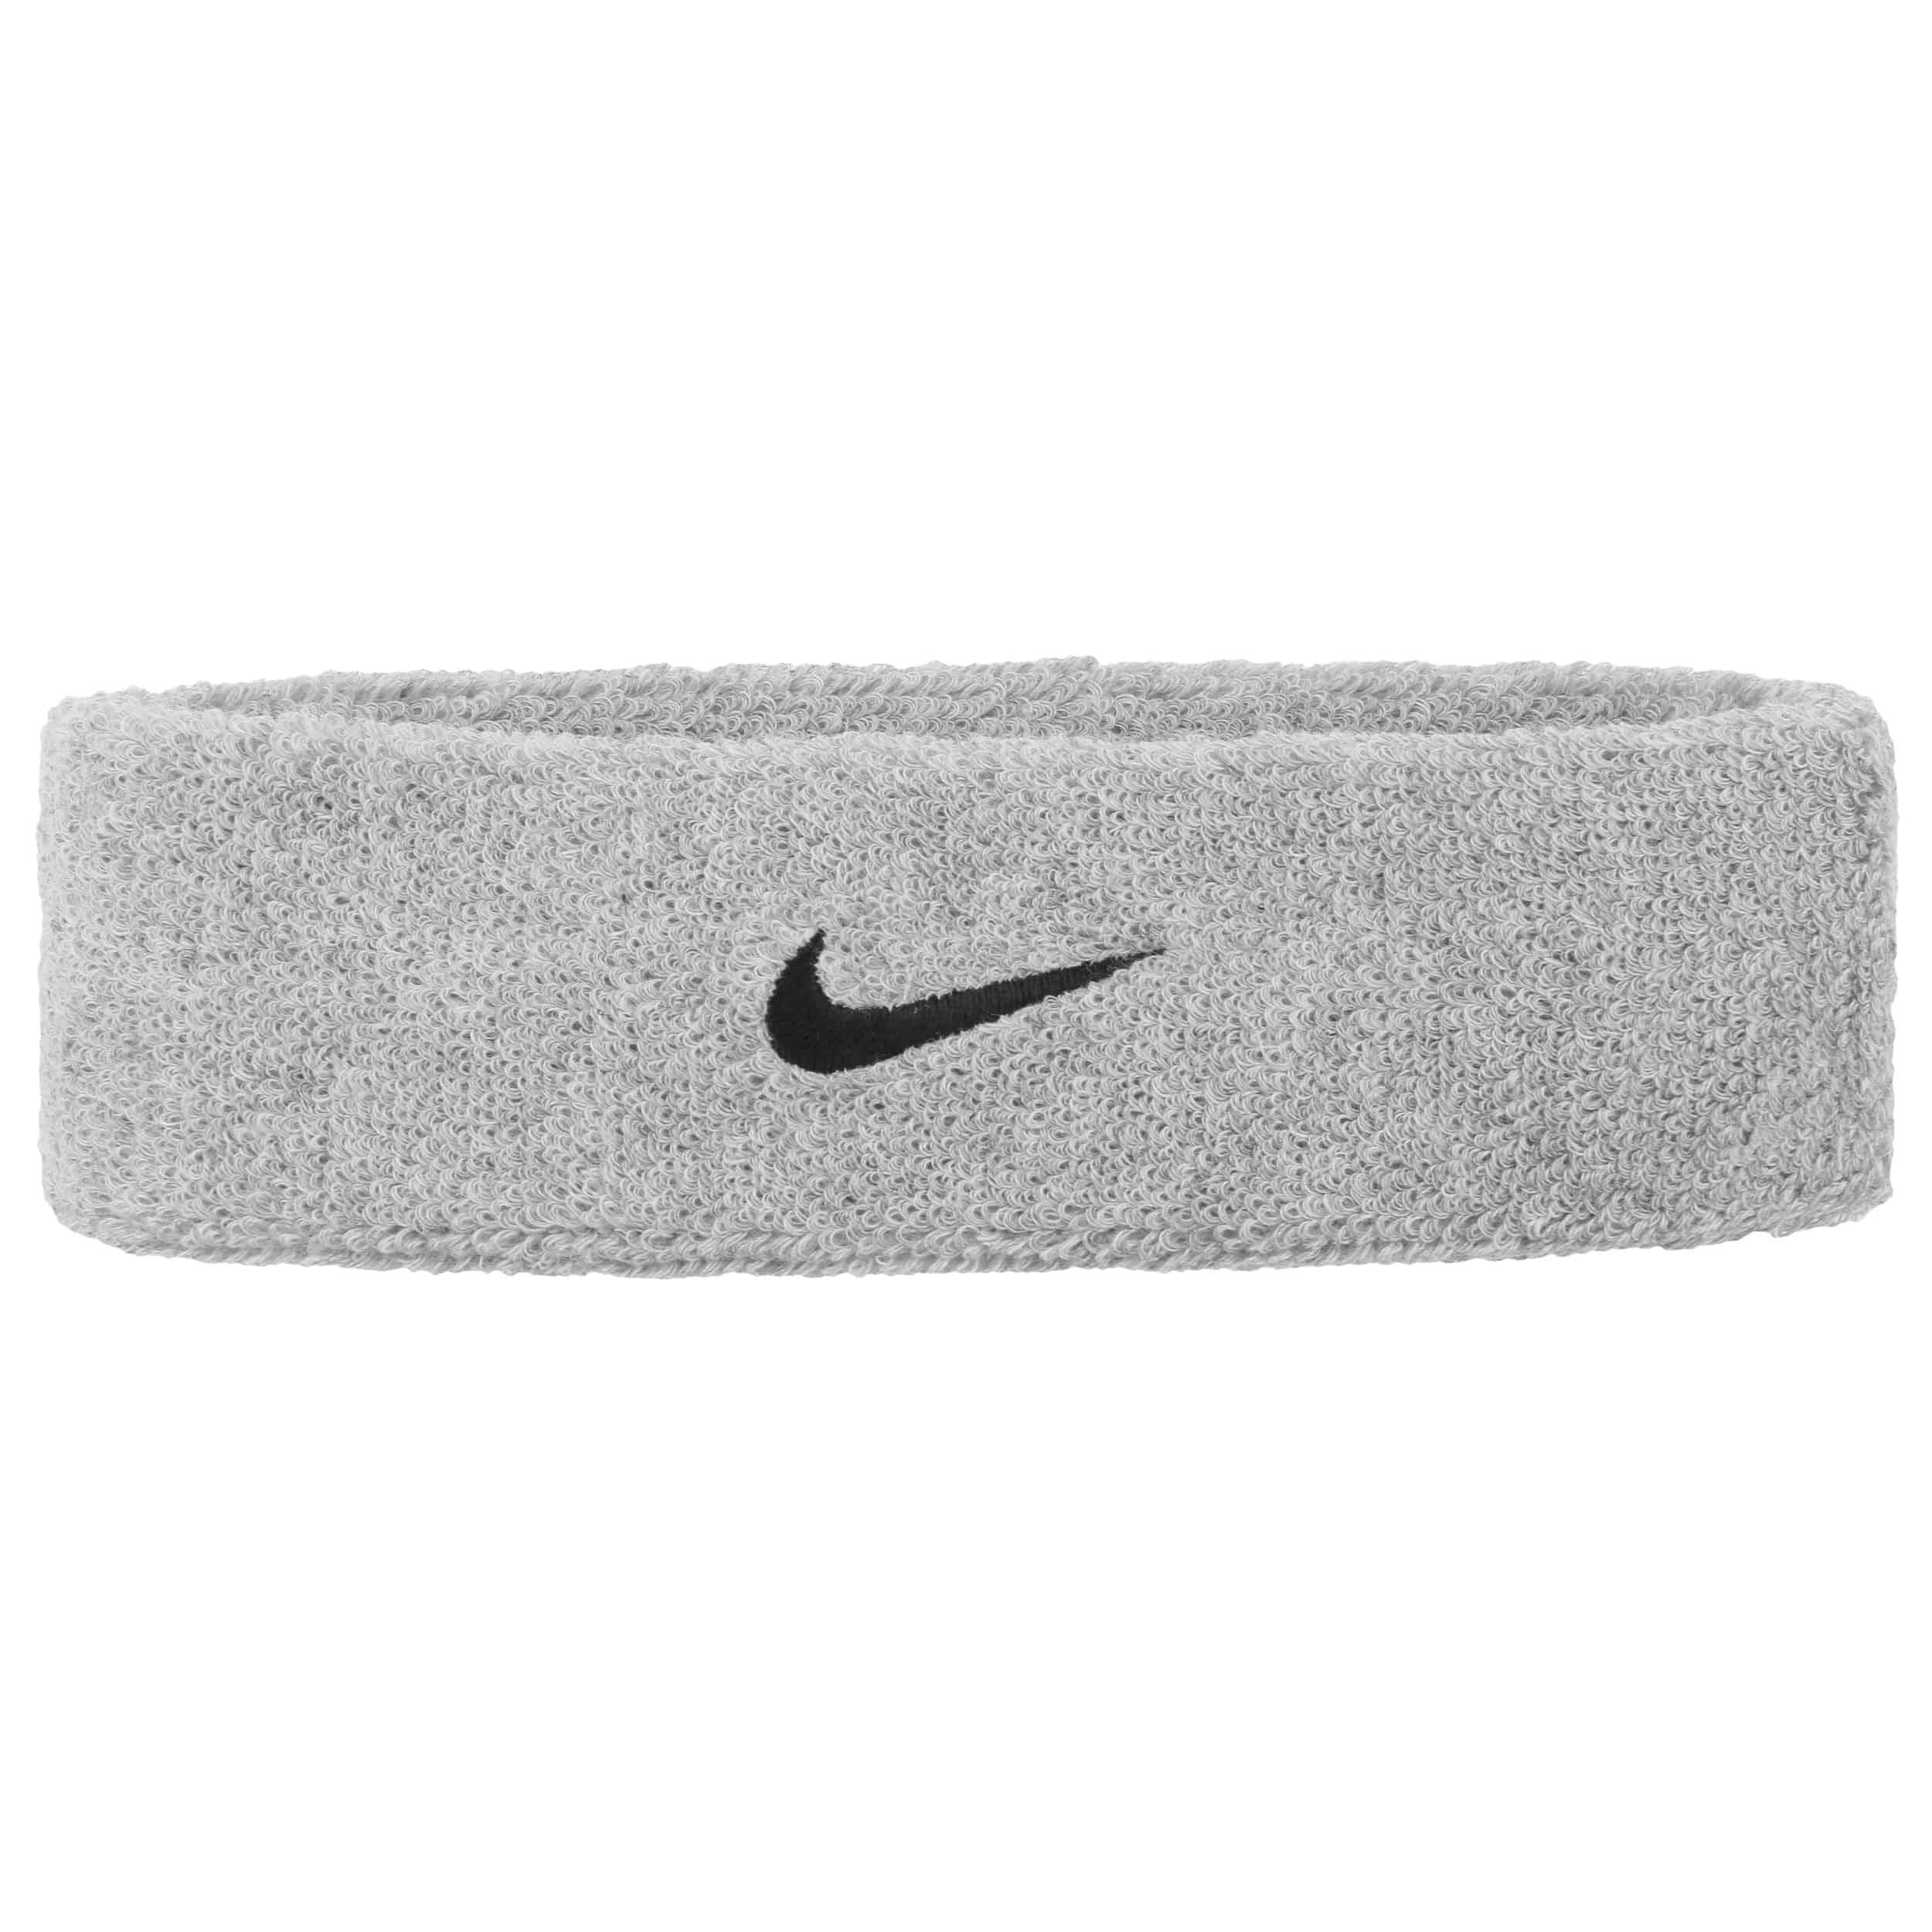 ... Swoosh Headband by Nike - grey 2 ... 6b99063e94b